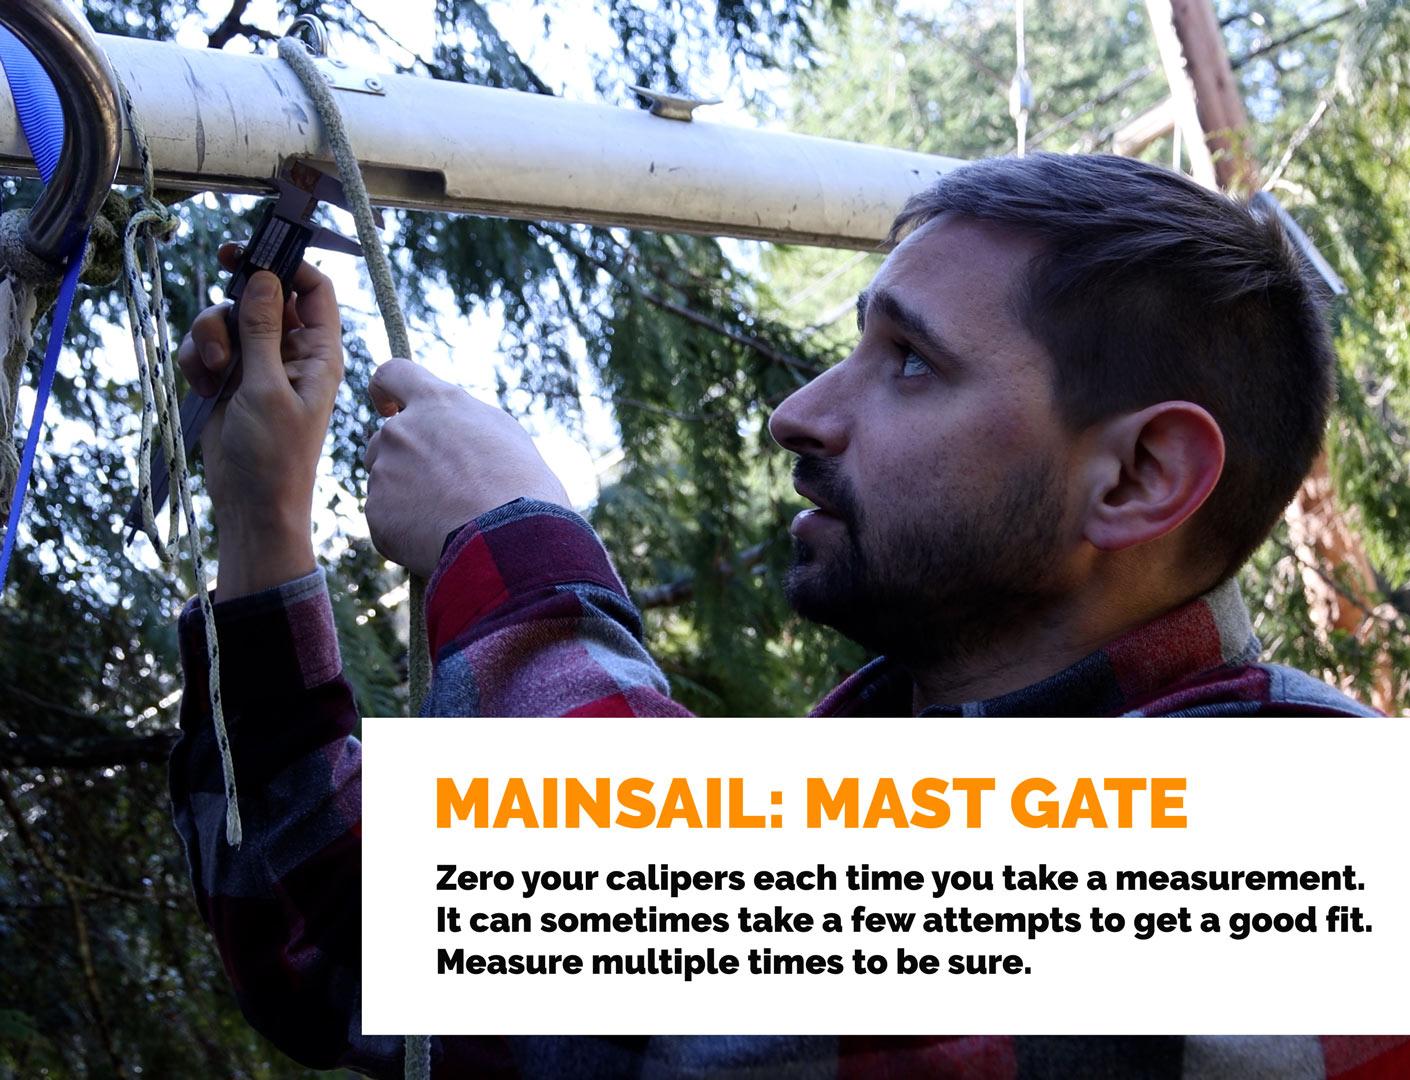 Mainsail: Mast Gate